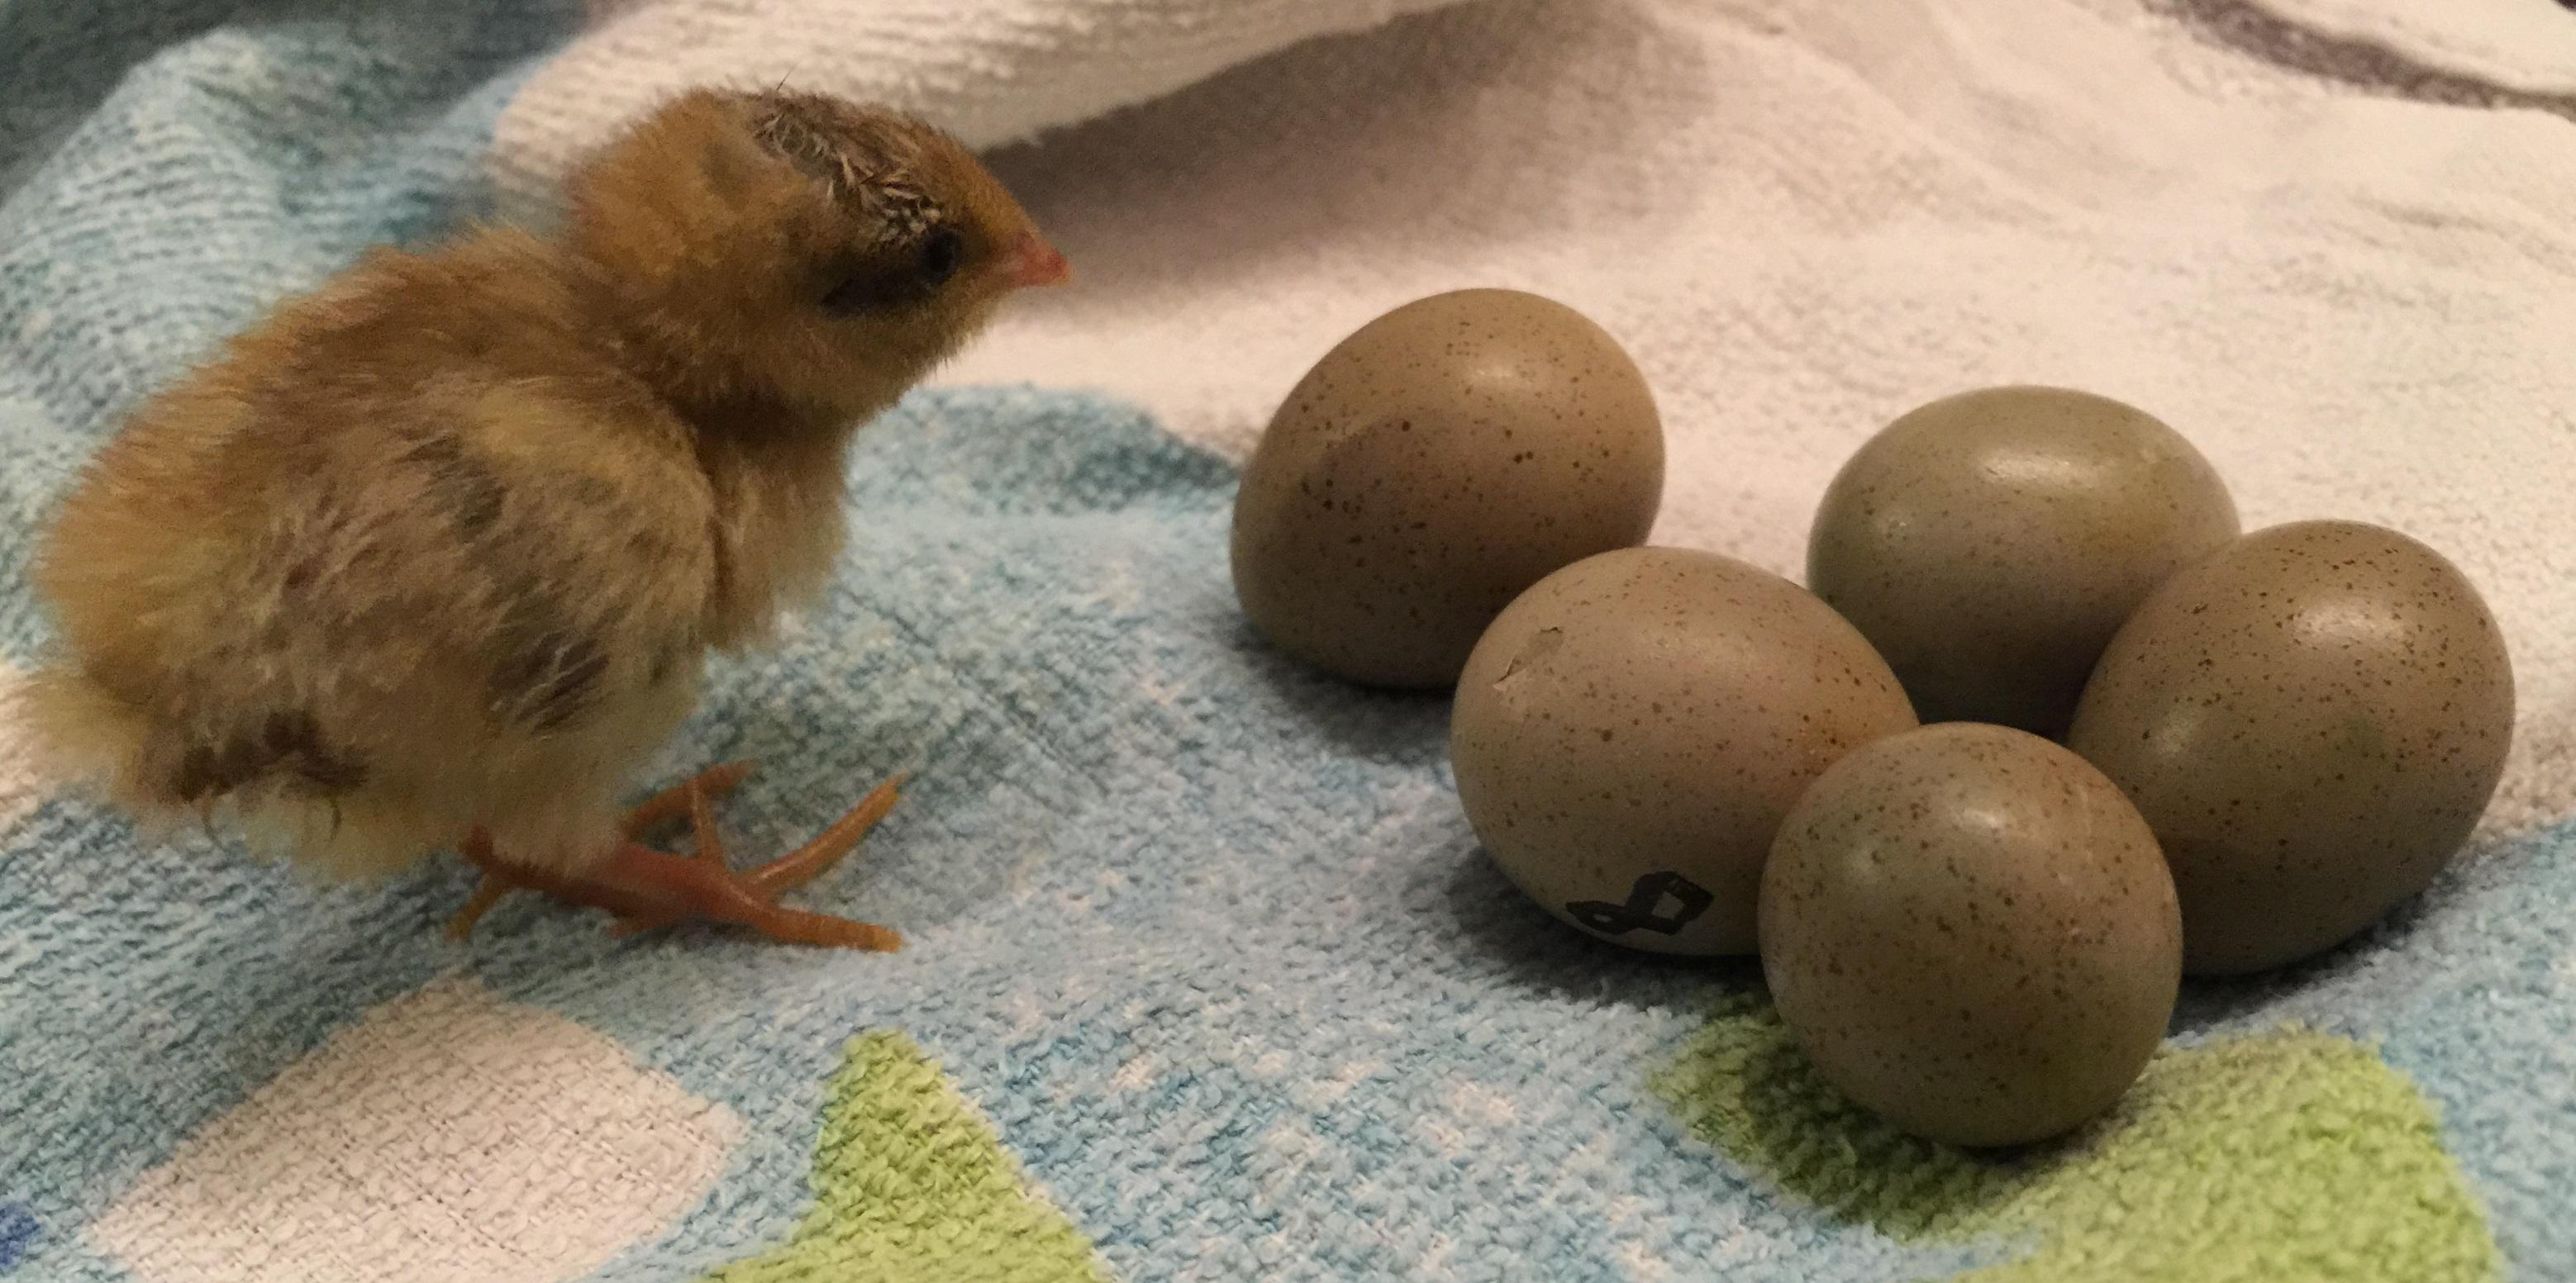 Dateiking Quail Eggs And Baby Bird10daysjpg Wikipedia